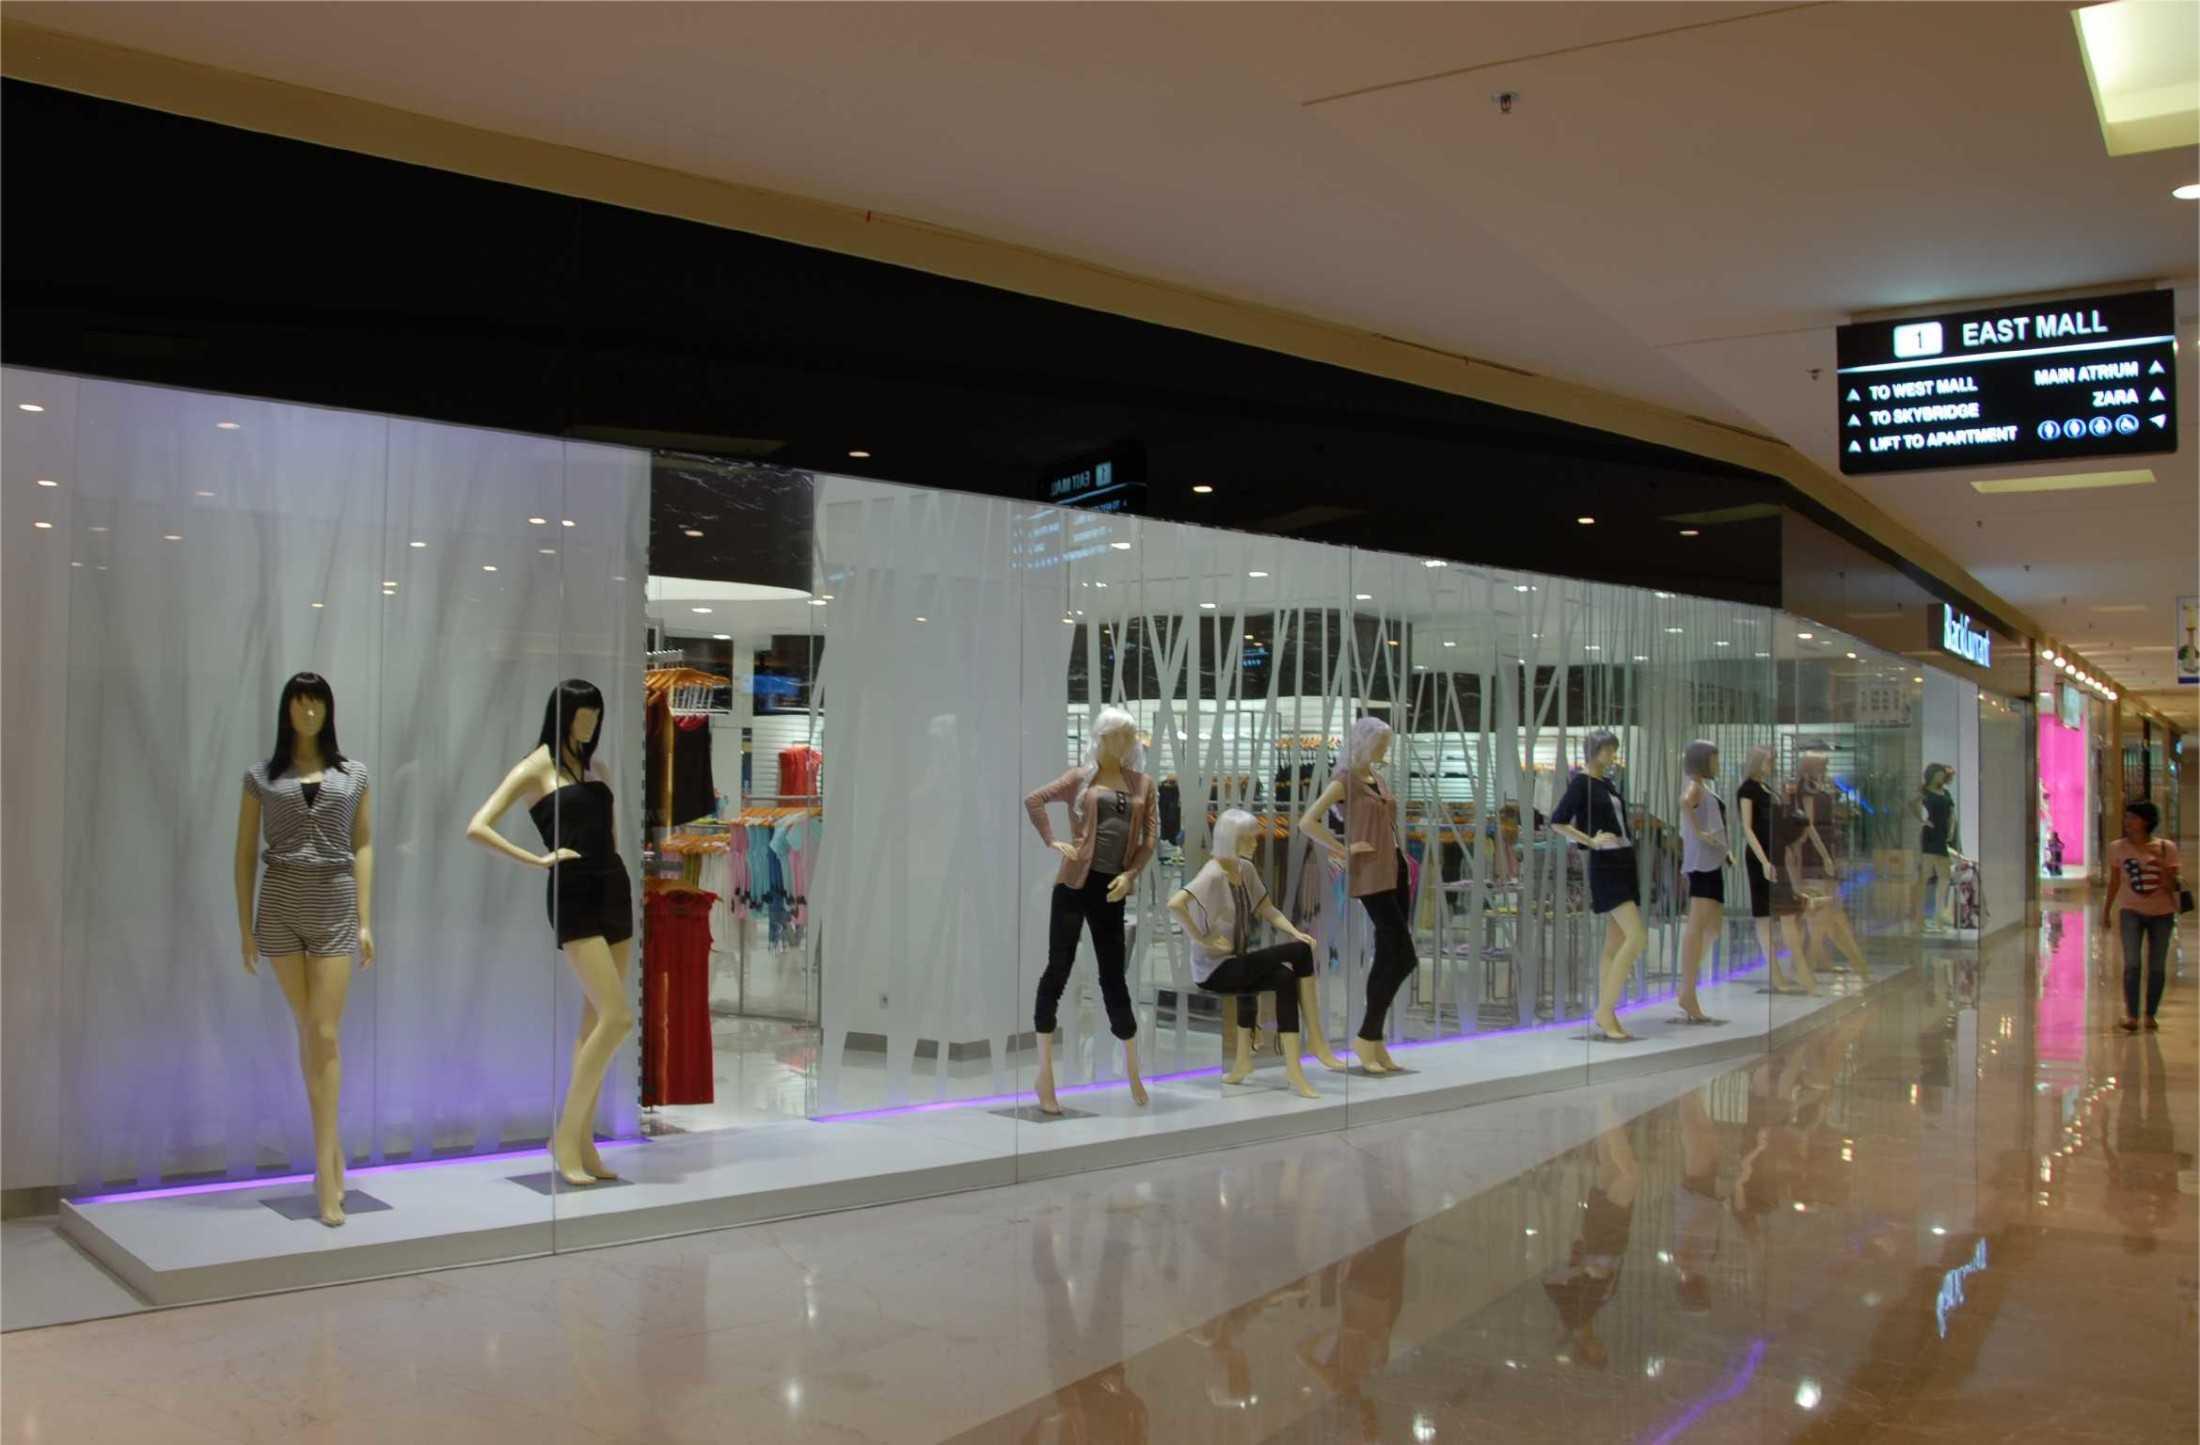 Foto inspirasi ide desain display area kontemporer Ads-architect-black-currant oleh ADS Architect di Arsitag